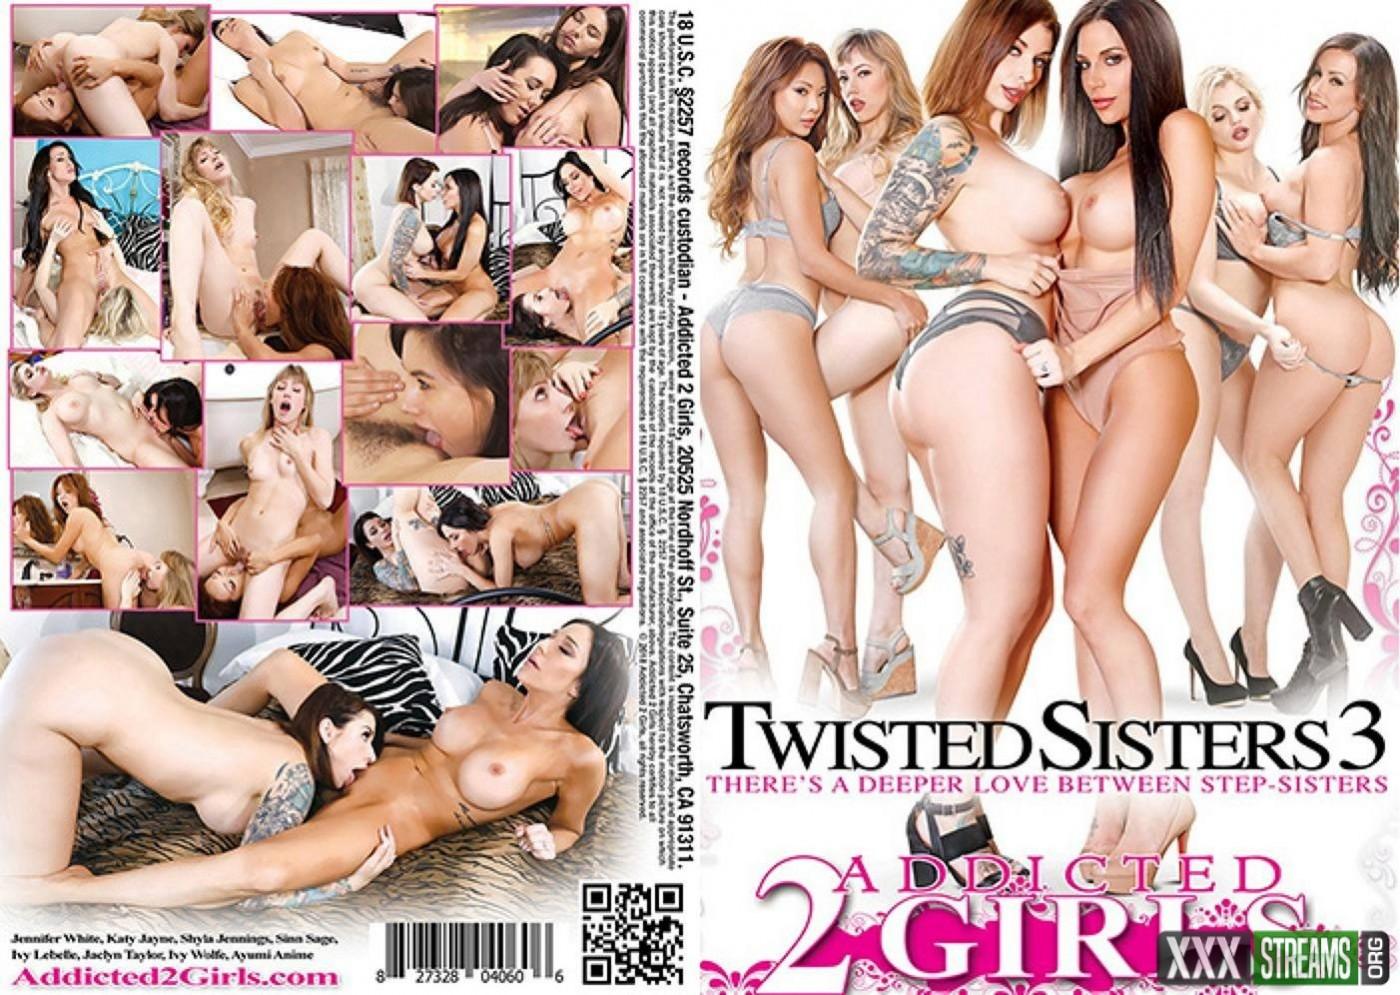 Twisted_Sisters_3__2018_d9fdd9e58fca367d.jpg